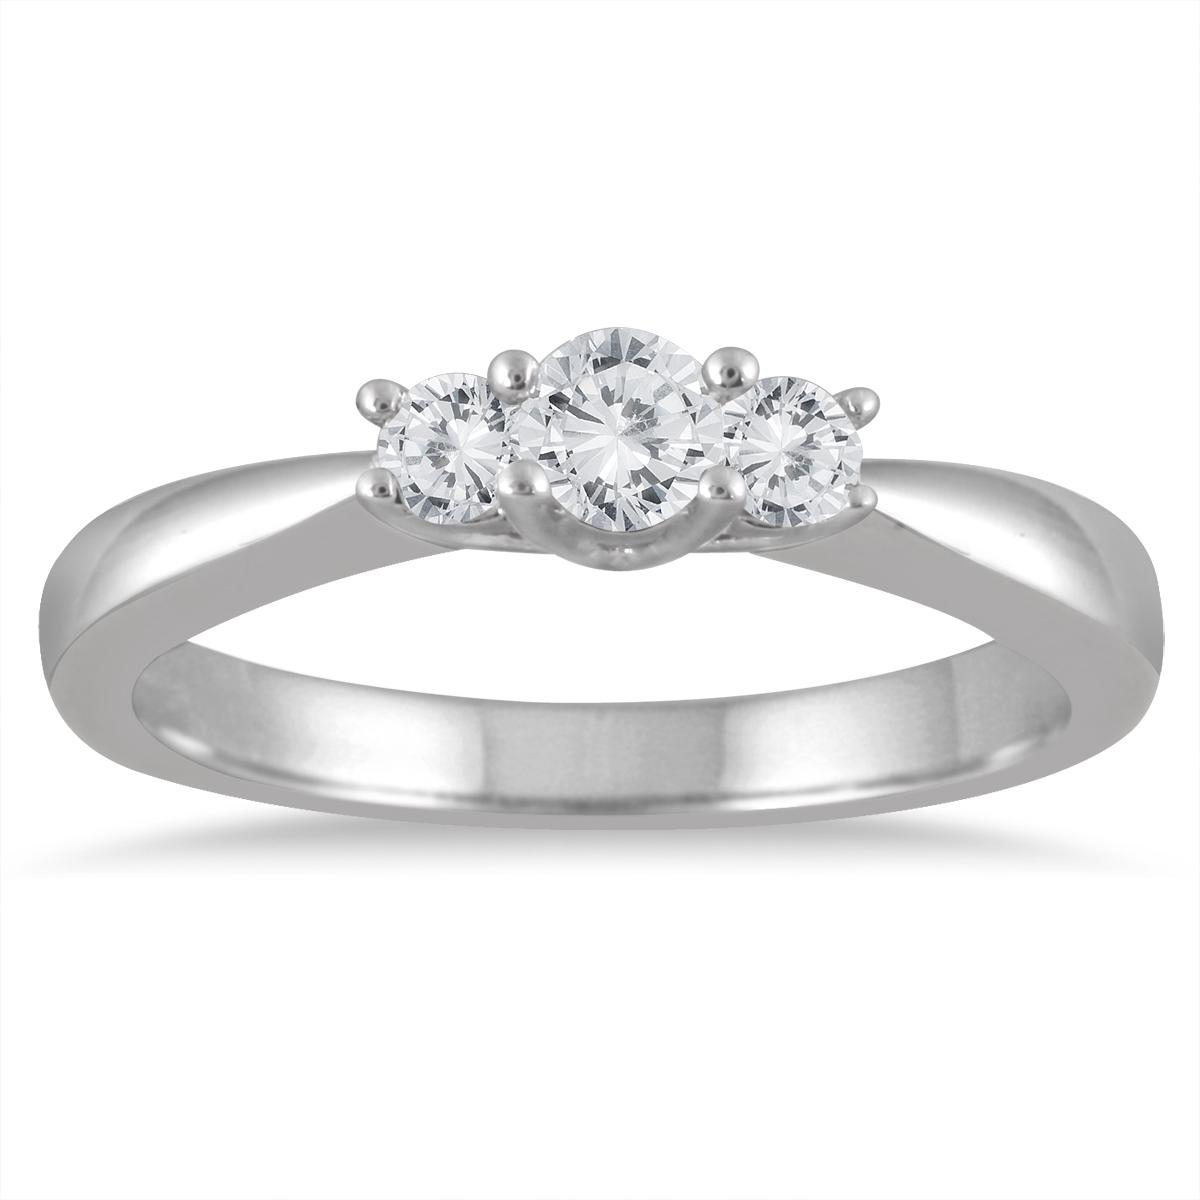 1/3 Carat TW Three Stone Diamond Ring